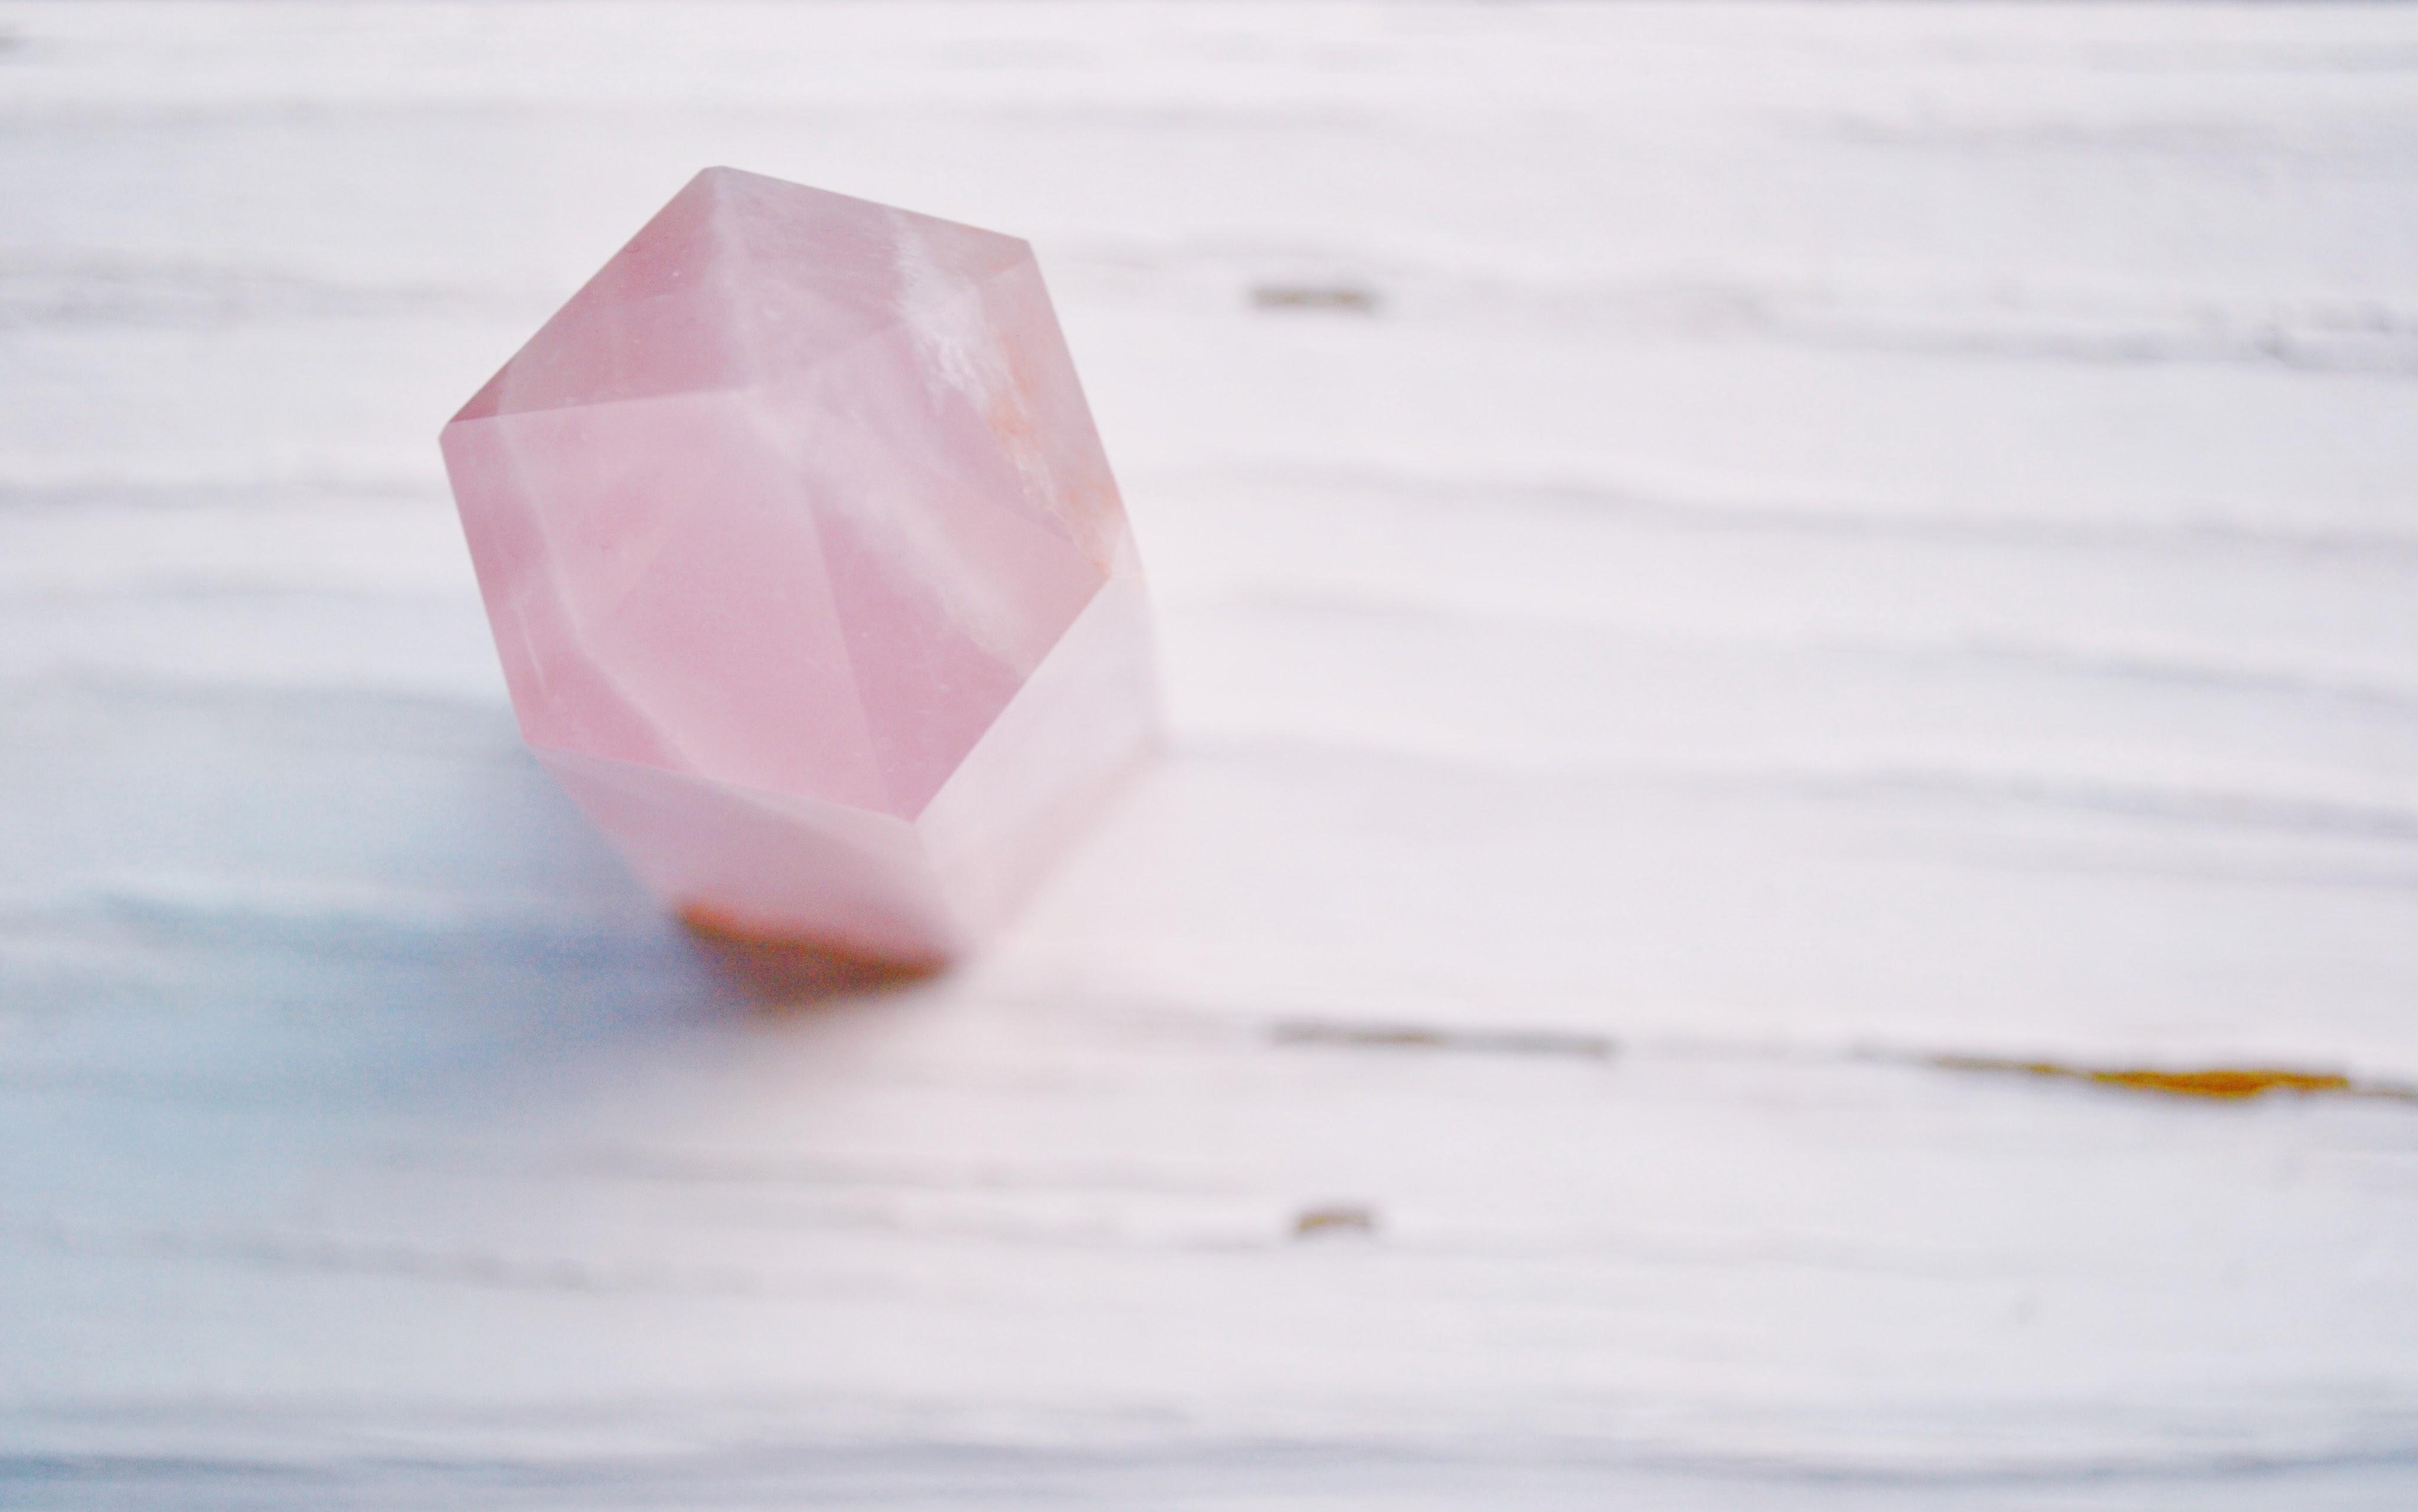 pink-gemstone-1573247